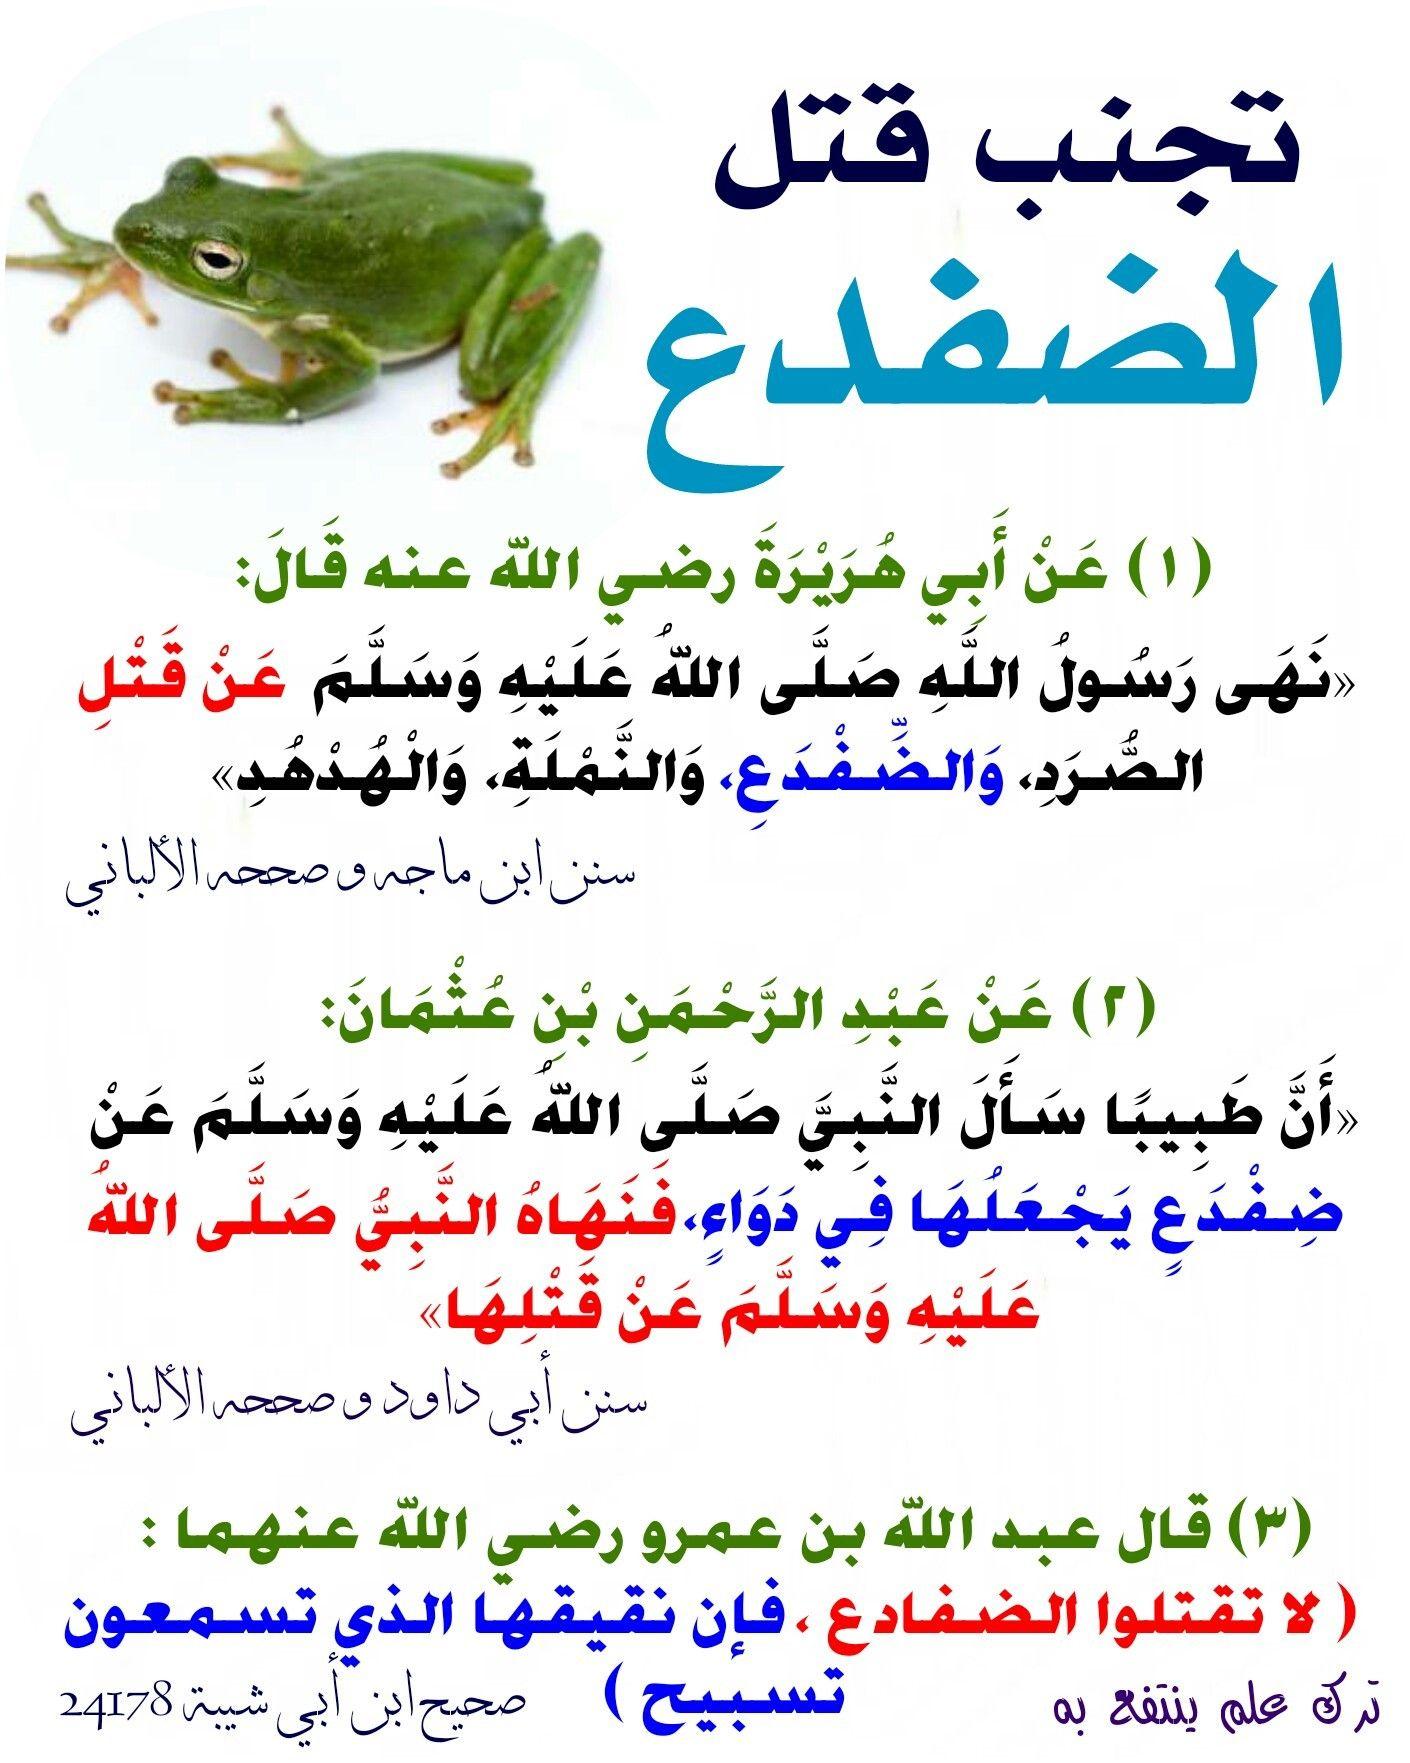 حكم قتل الضفدع Quran Quotes Islamic Quotes Quran Hadith Quotes